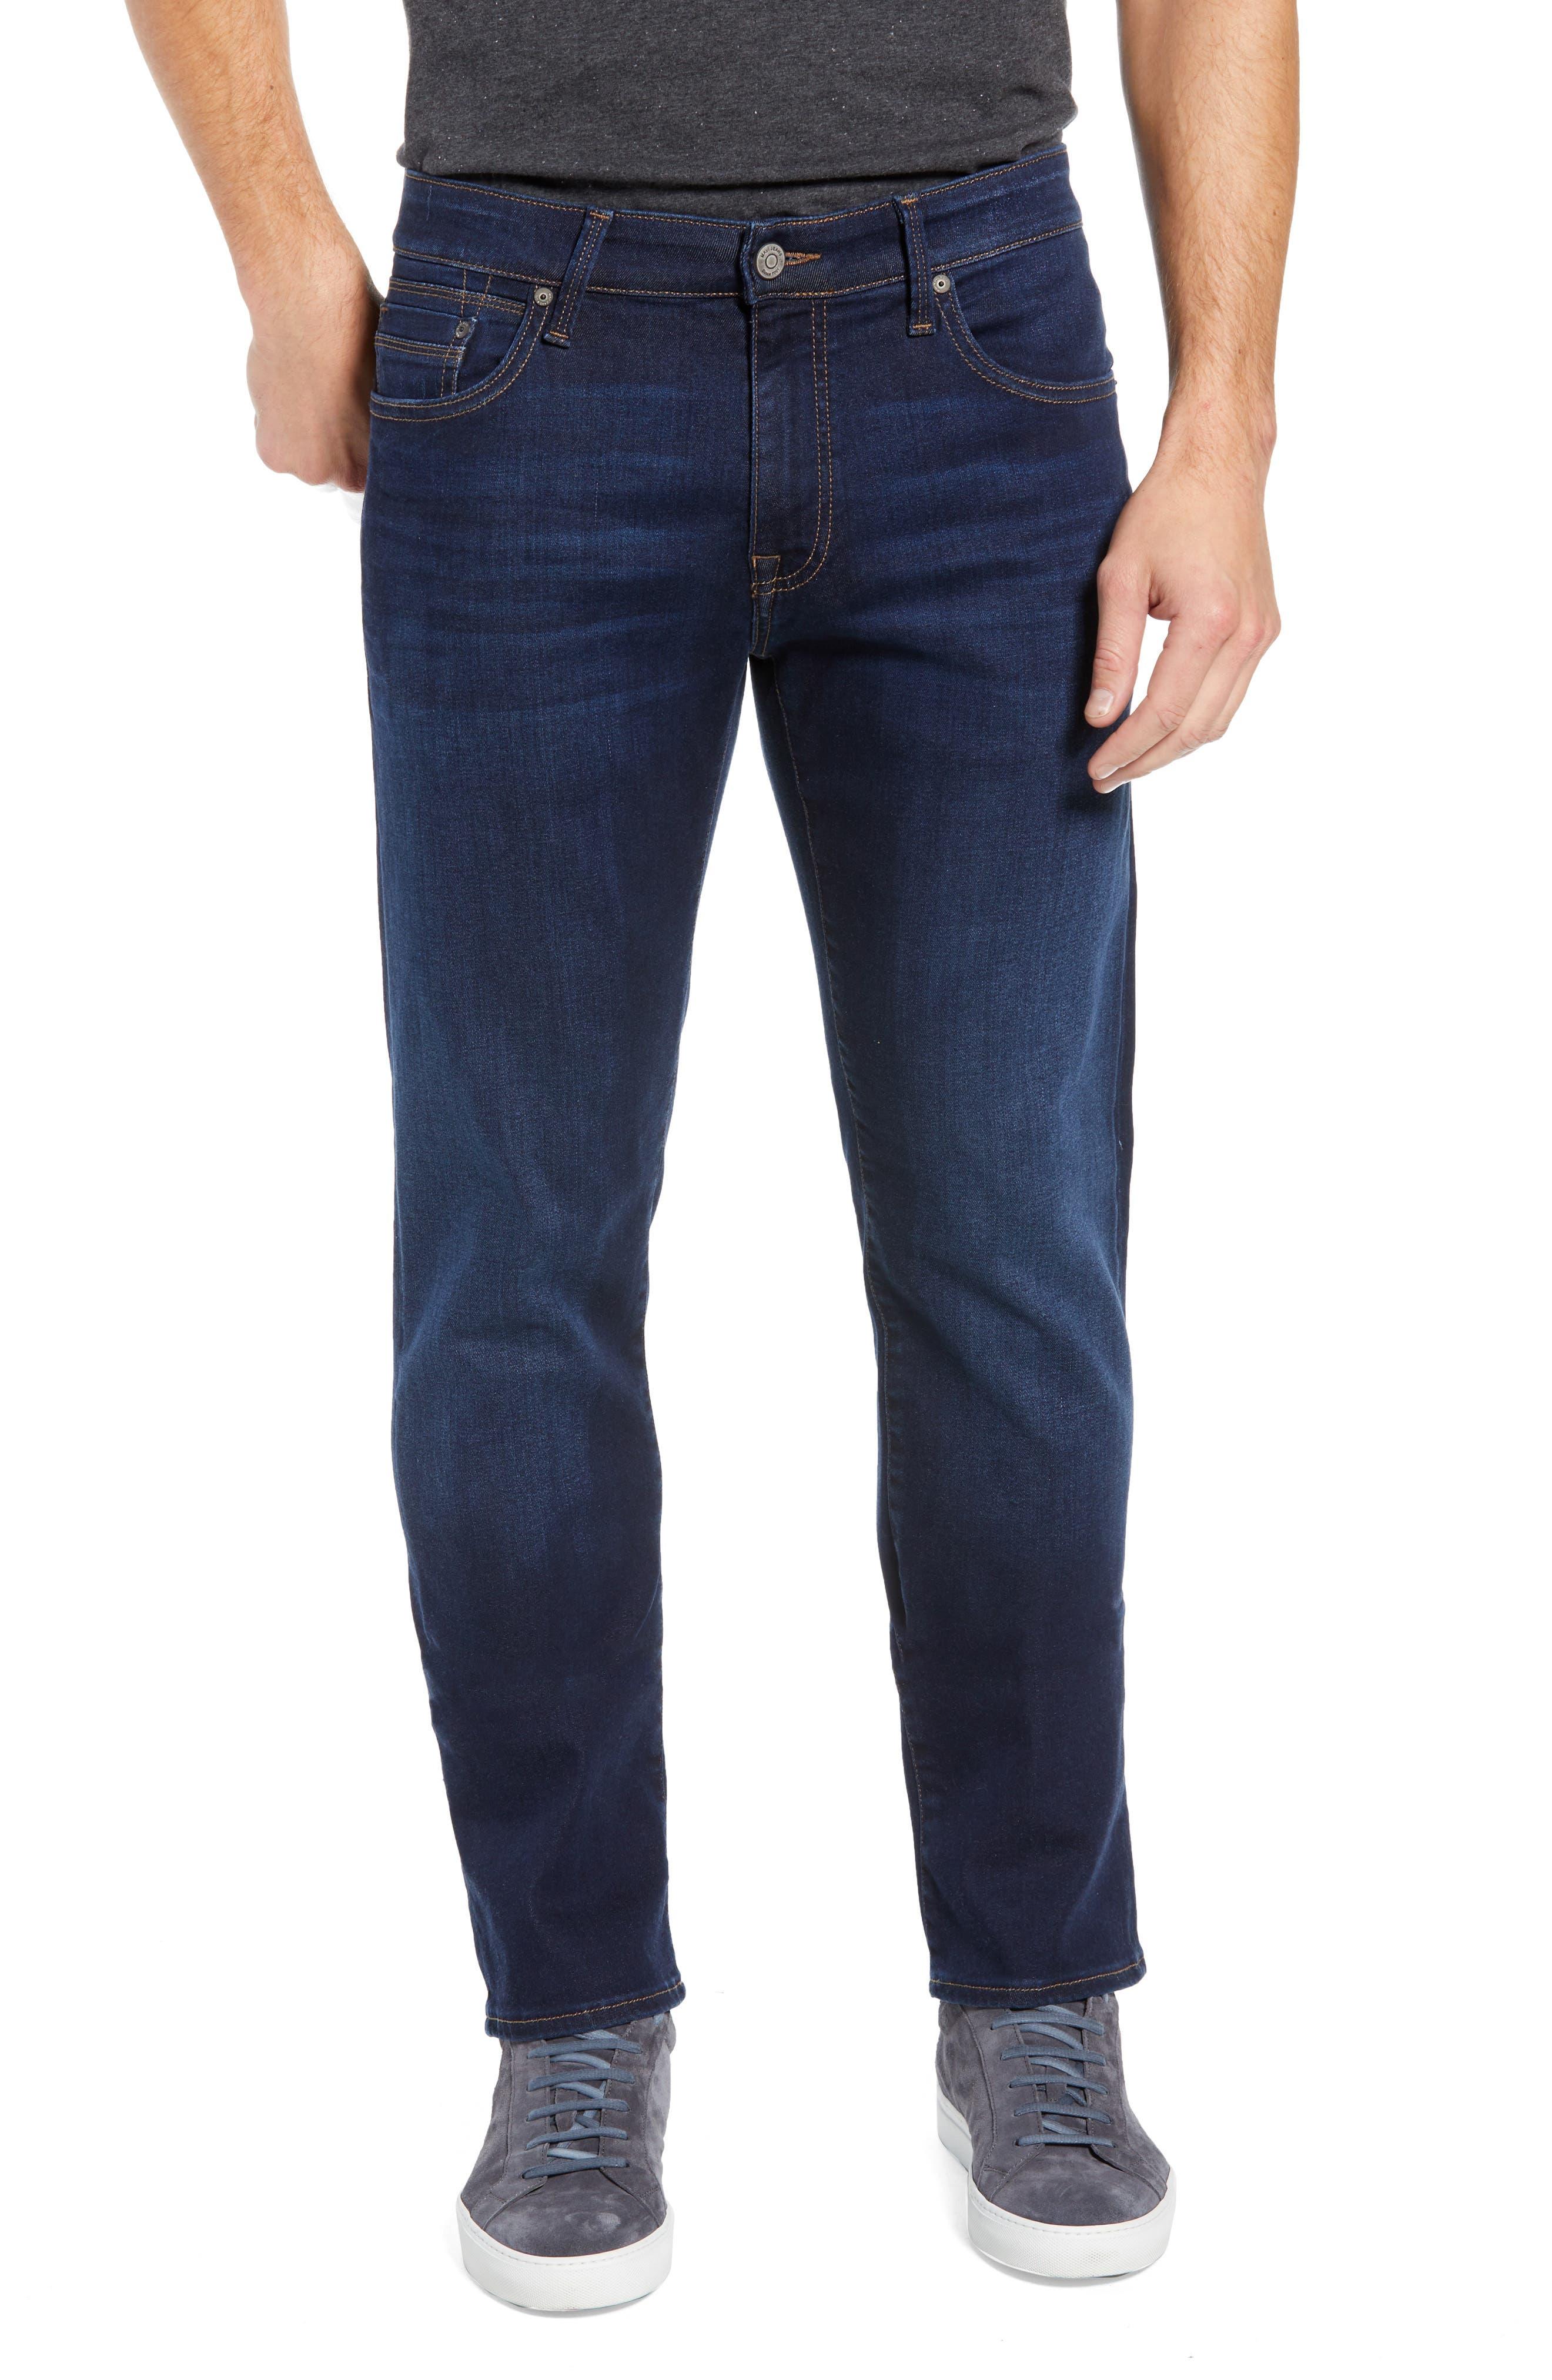 Zach Straight Leg Jeans,                         Main,                         color, DEEP SOFT MOVE